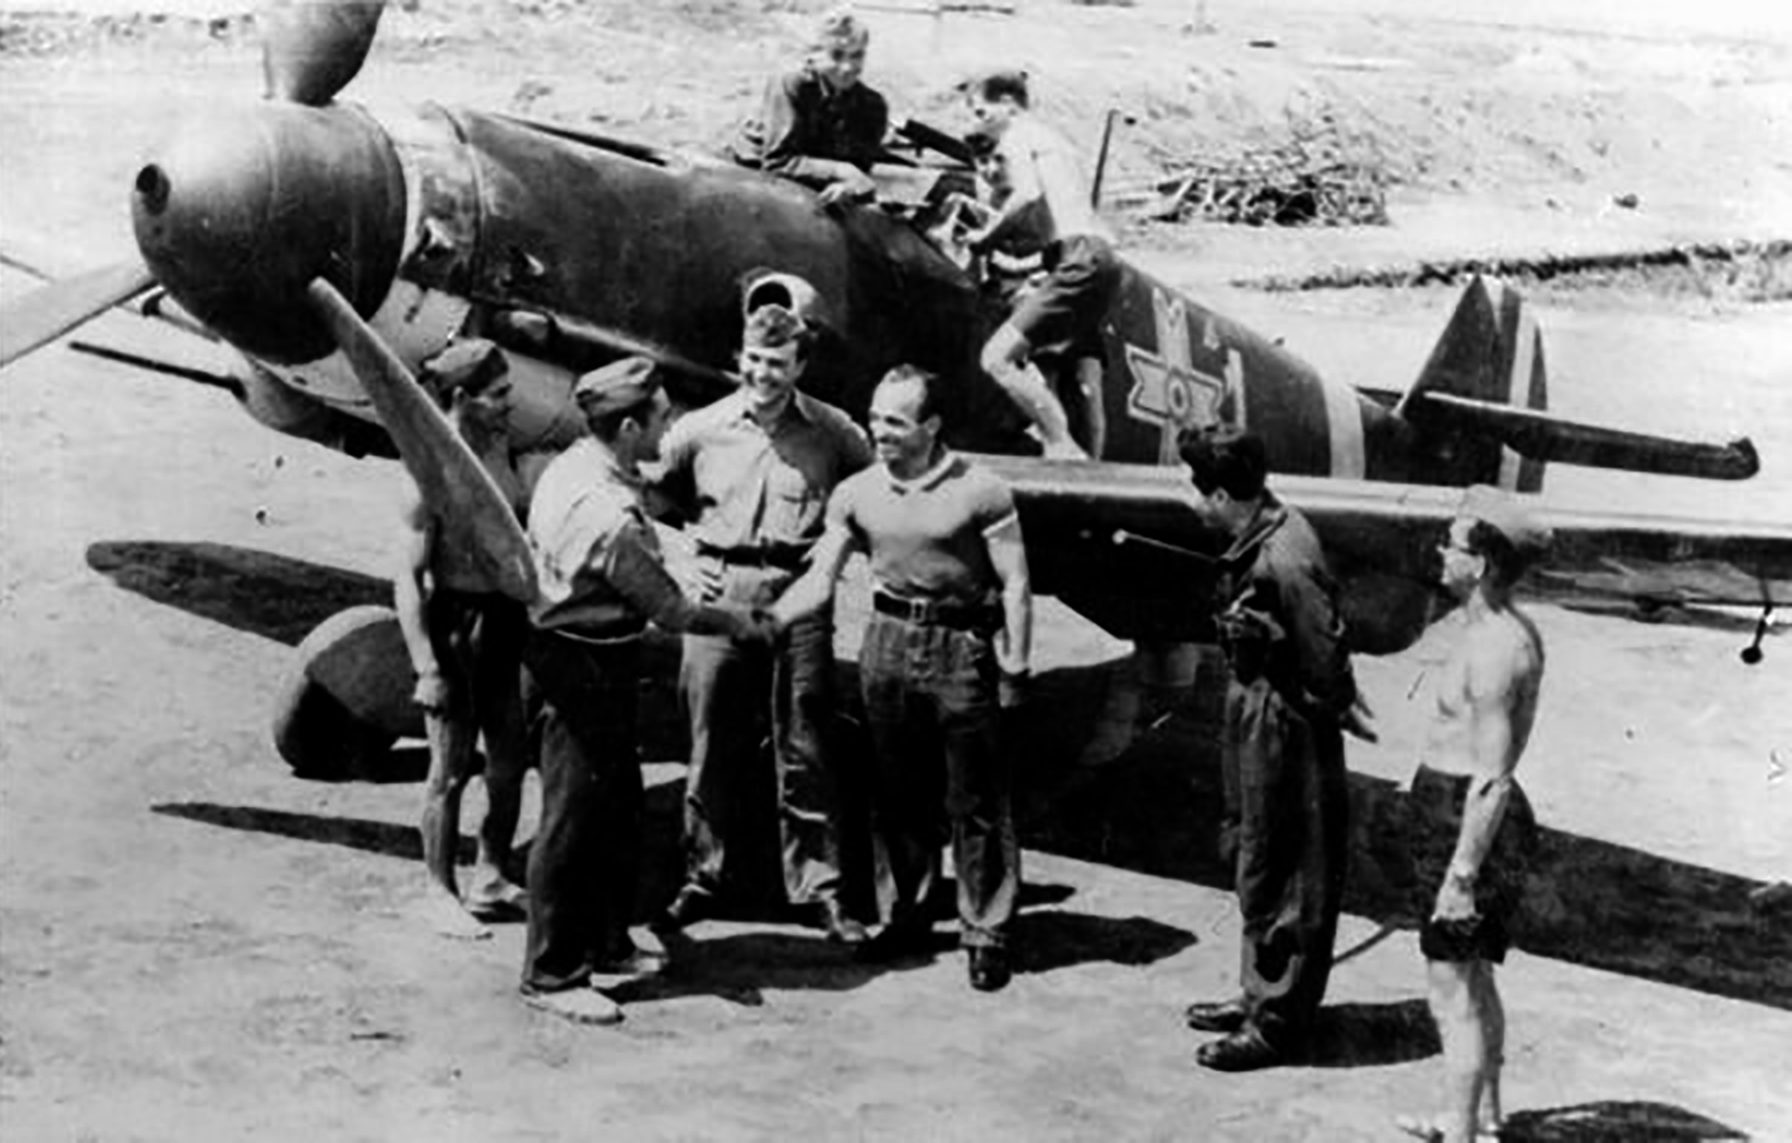 8713 RAACO 105583 Einsatz Einsatz 55 A7-1 B.79xT.109xH.47mm transpar a.PP f.Nr